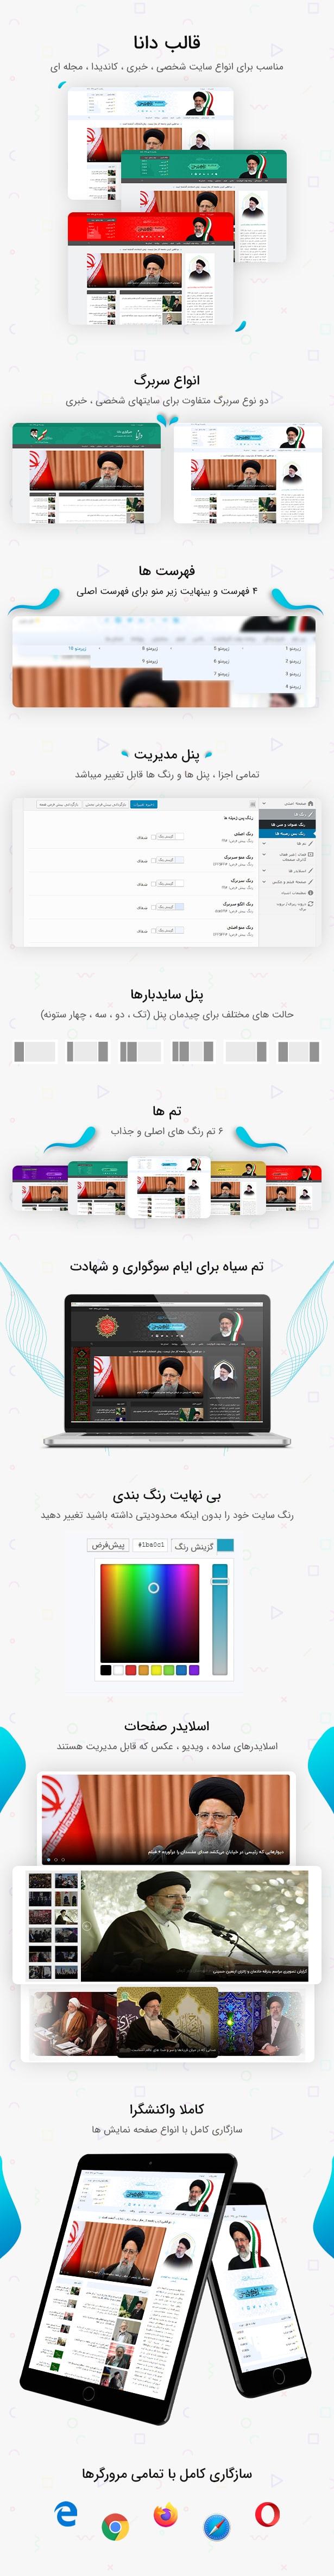 8545 c2e02a6697ee780aa5bd899d0 - قالب دانا | قالب ایرانی وردپرس انتخابات